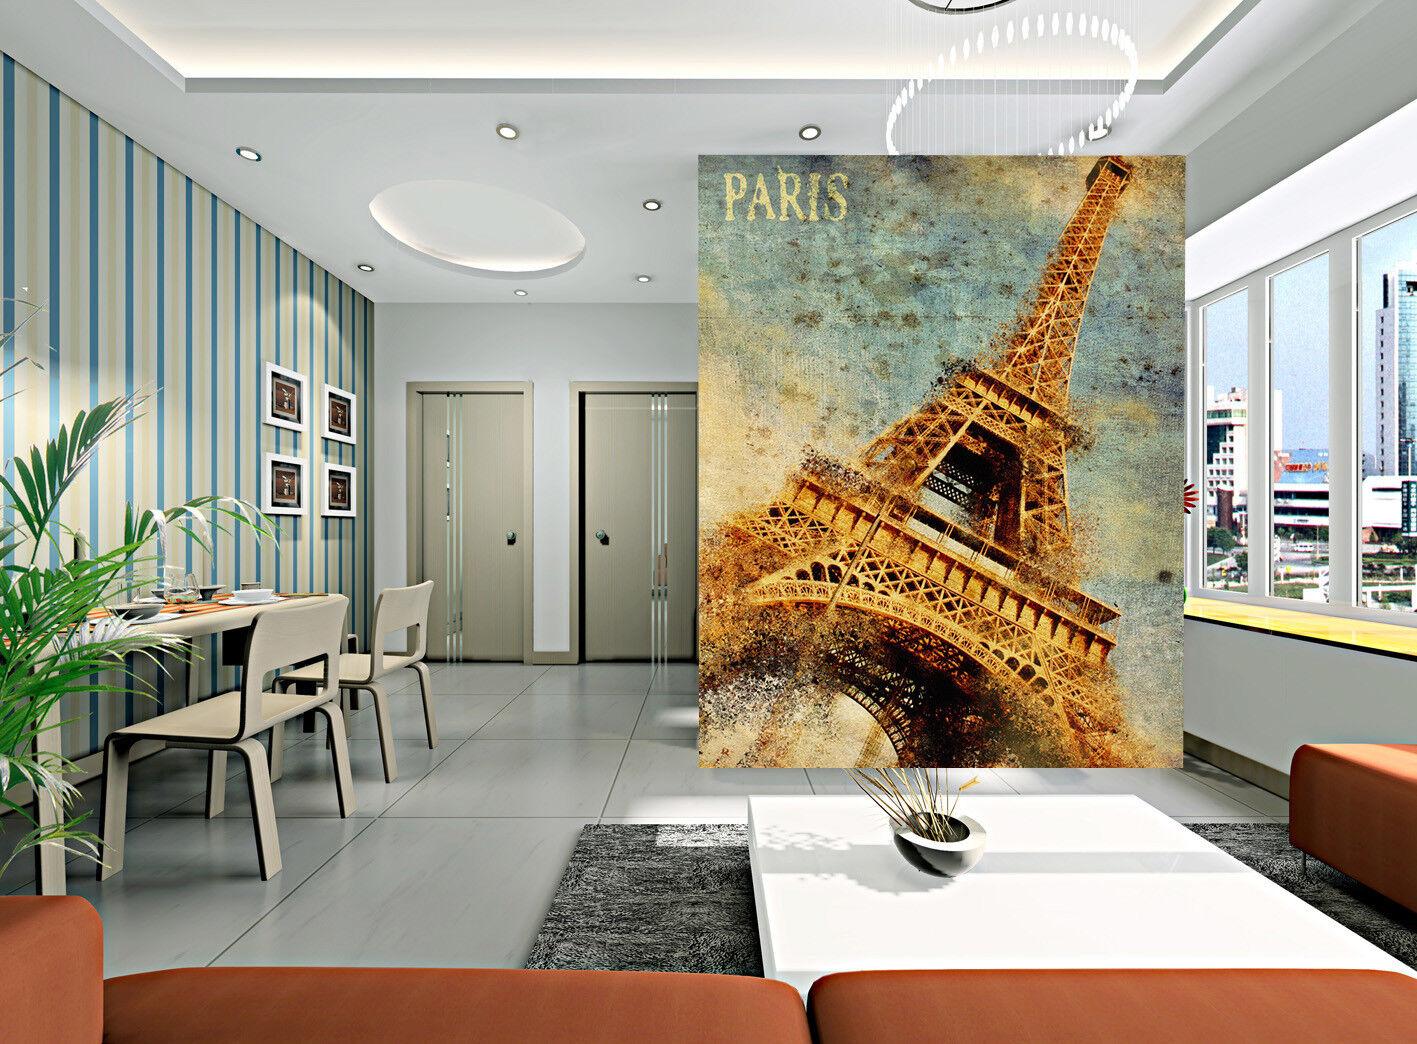 3D Eiffel Tower 62 Wallpaper Murals Wall Print Wallpaper Mural AJ WALL AU Lemon